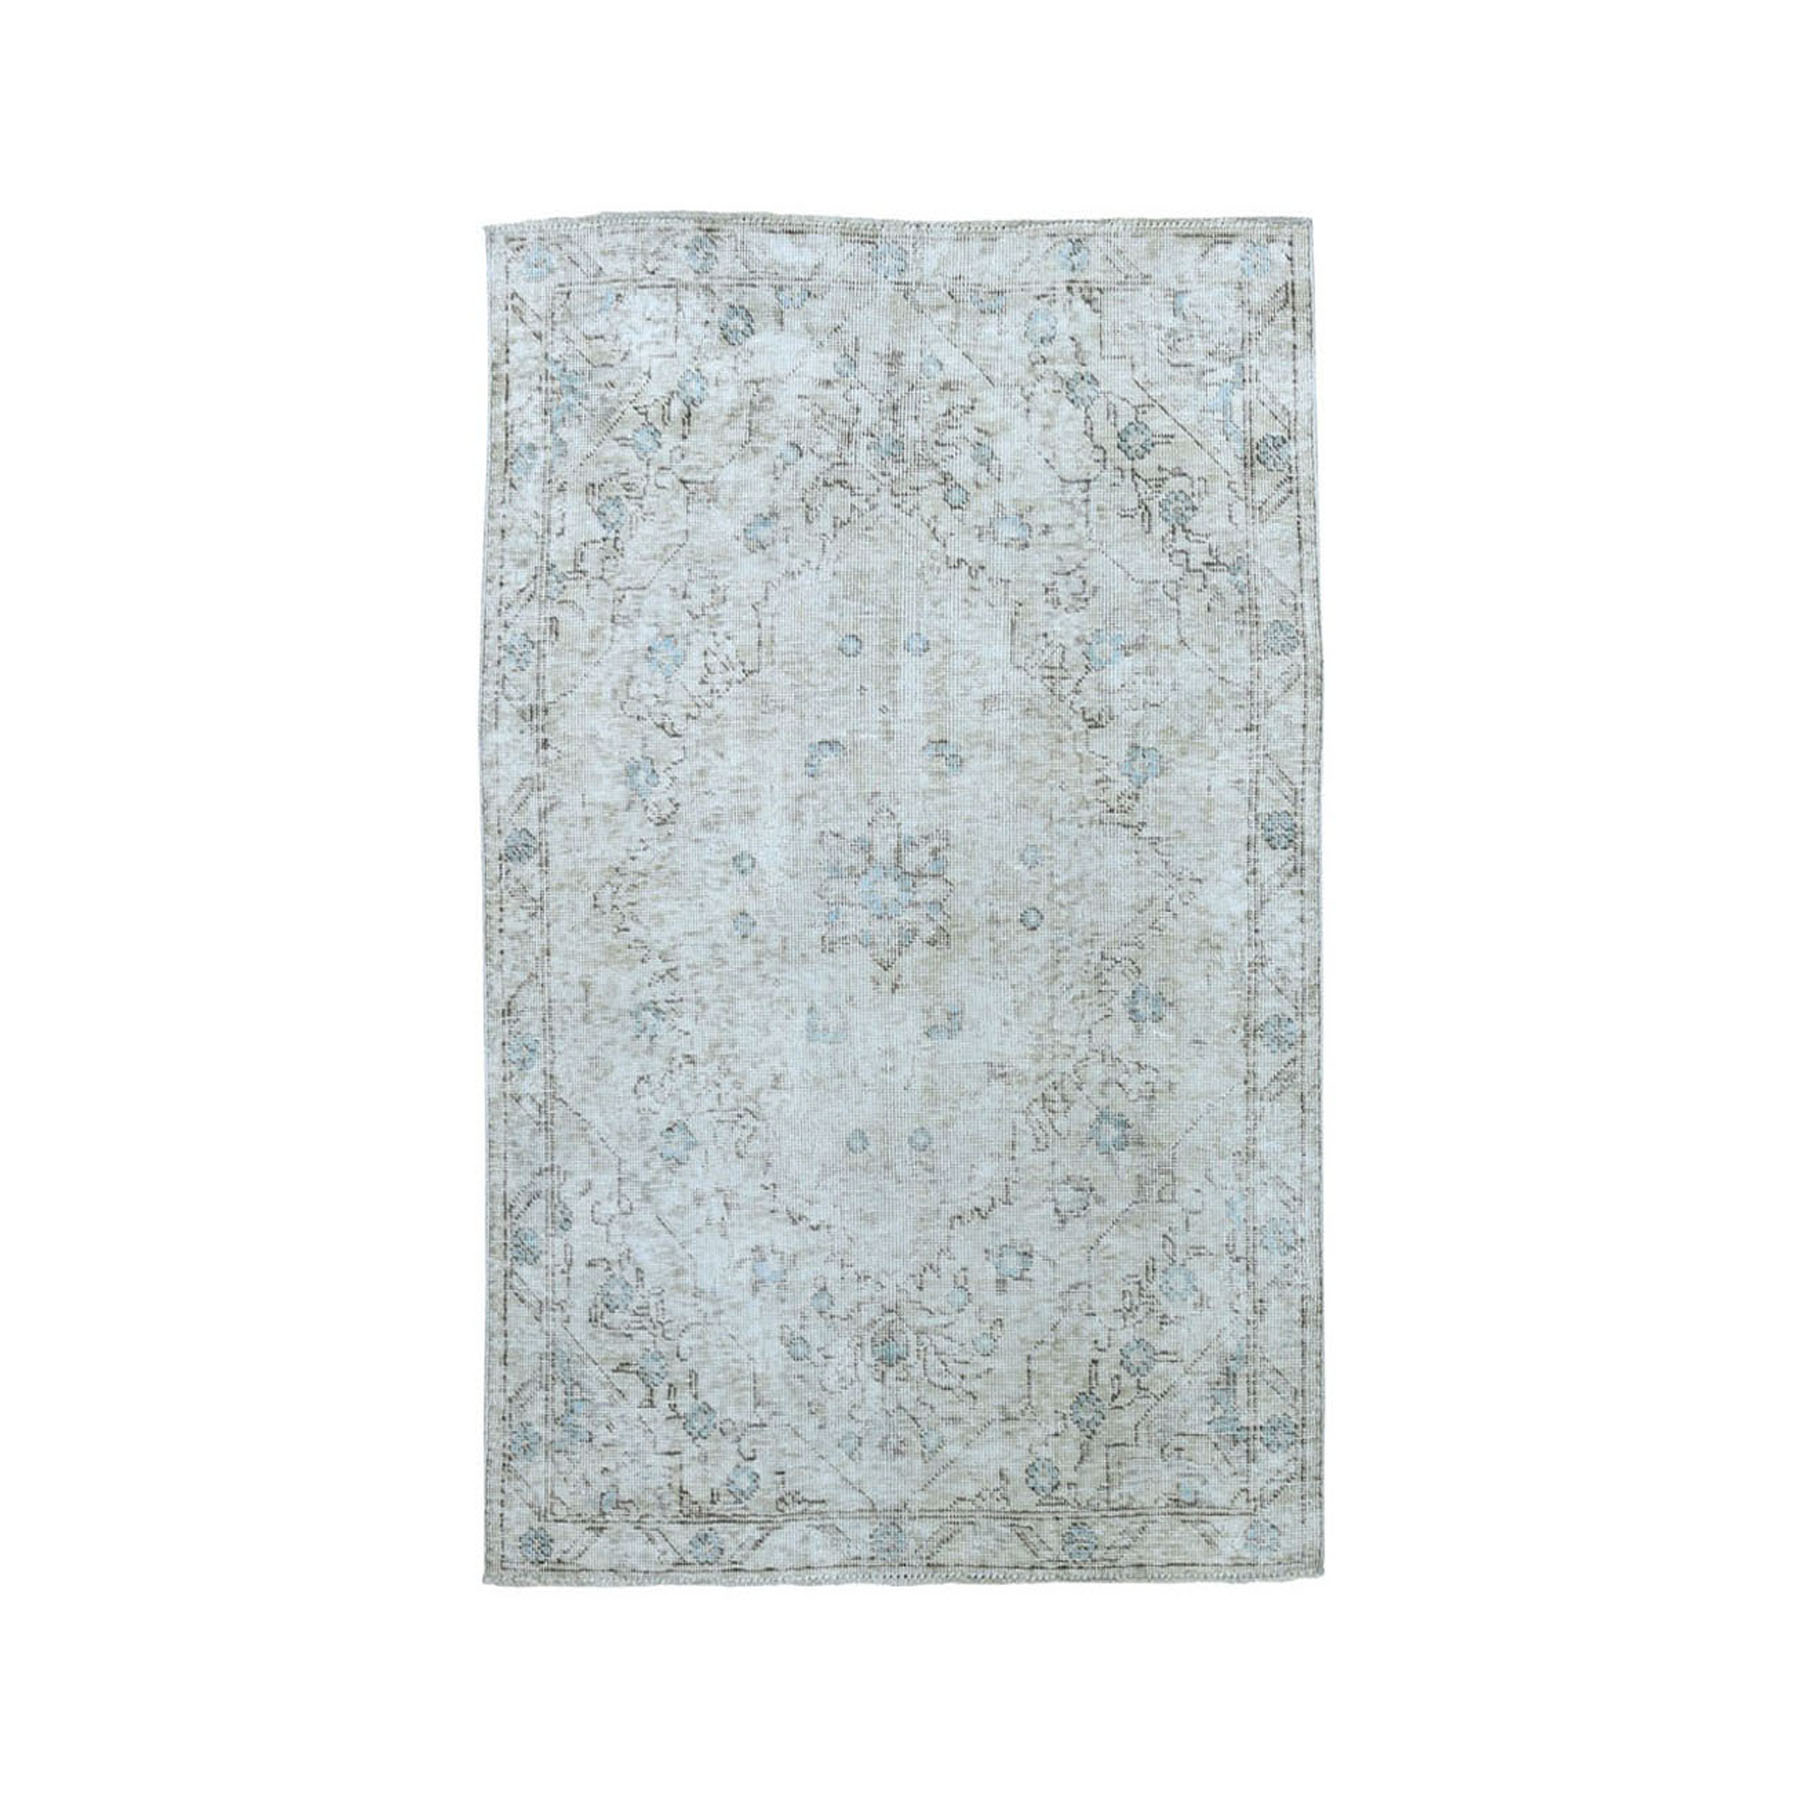 "3'X4'5"" Vintage White Wash Tabriz Worn Wool Hand-Knotted Oriental Rug moae07a6"